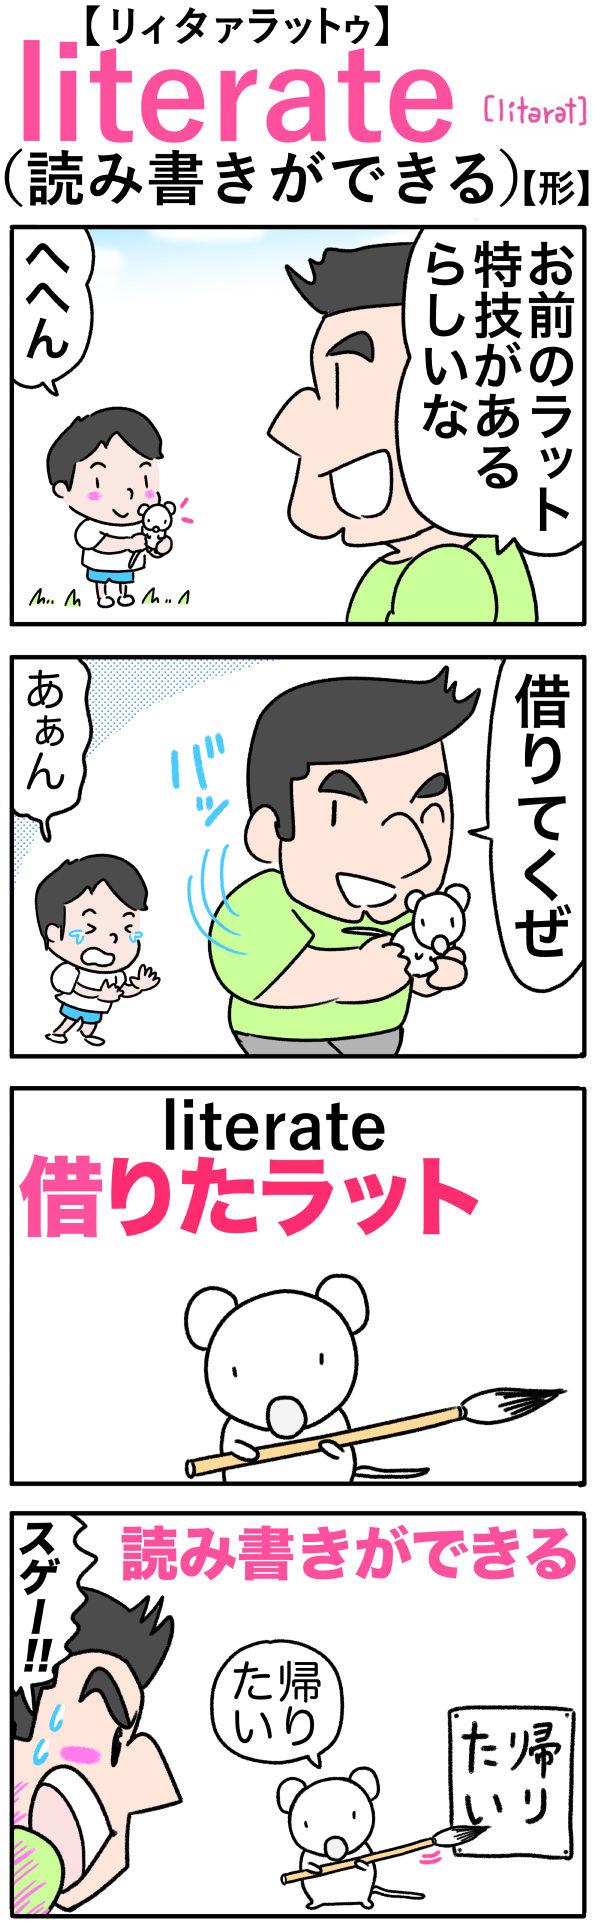 literate(読み書きができる)の語呂合わせ英単語